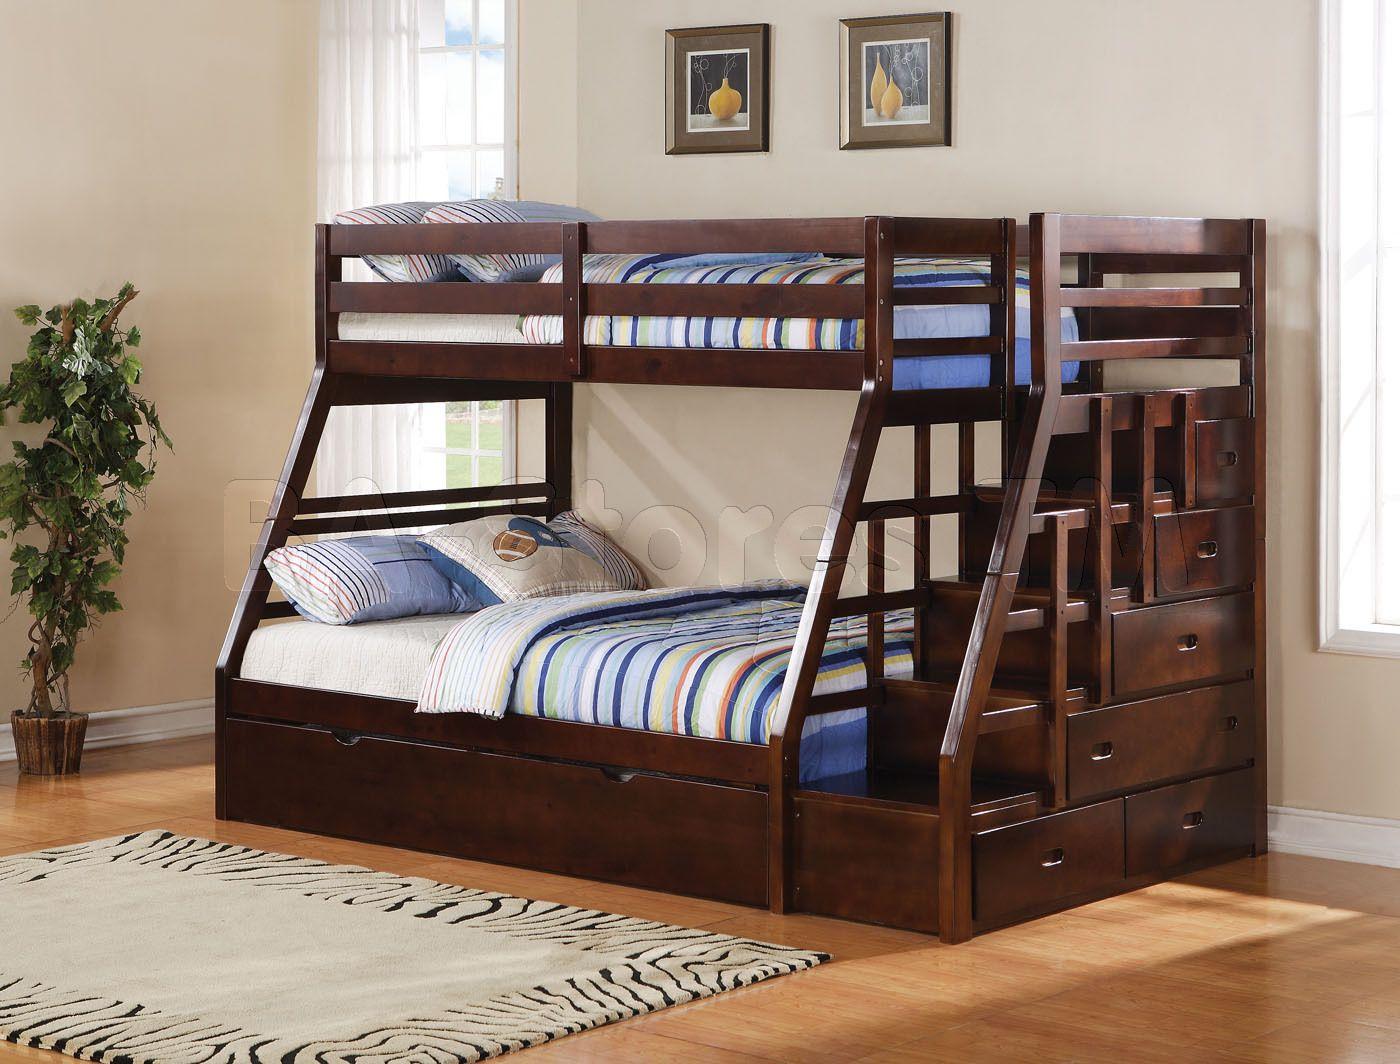 Twin loft bed with stairs and storage  Pas cher Jumeau Plus Complète lits Superposés photo    chambre